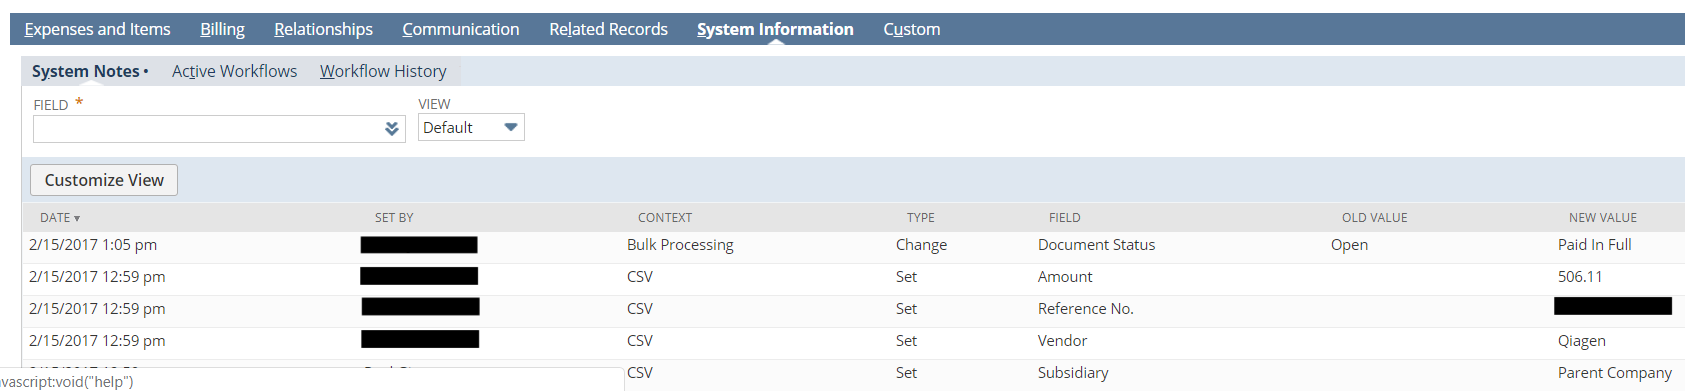 System Information screenshot-2